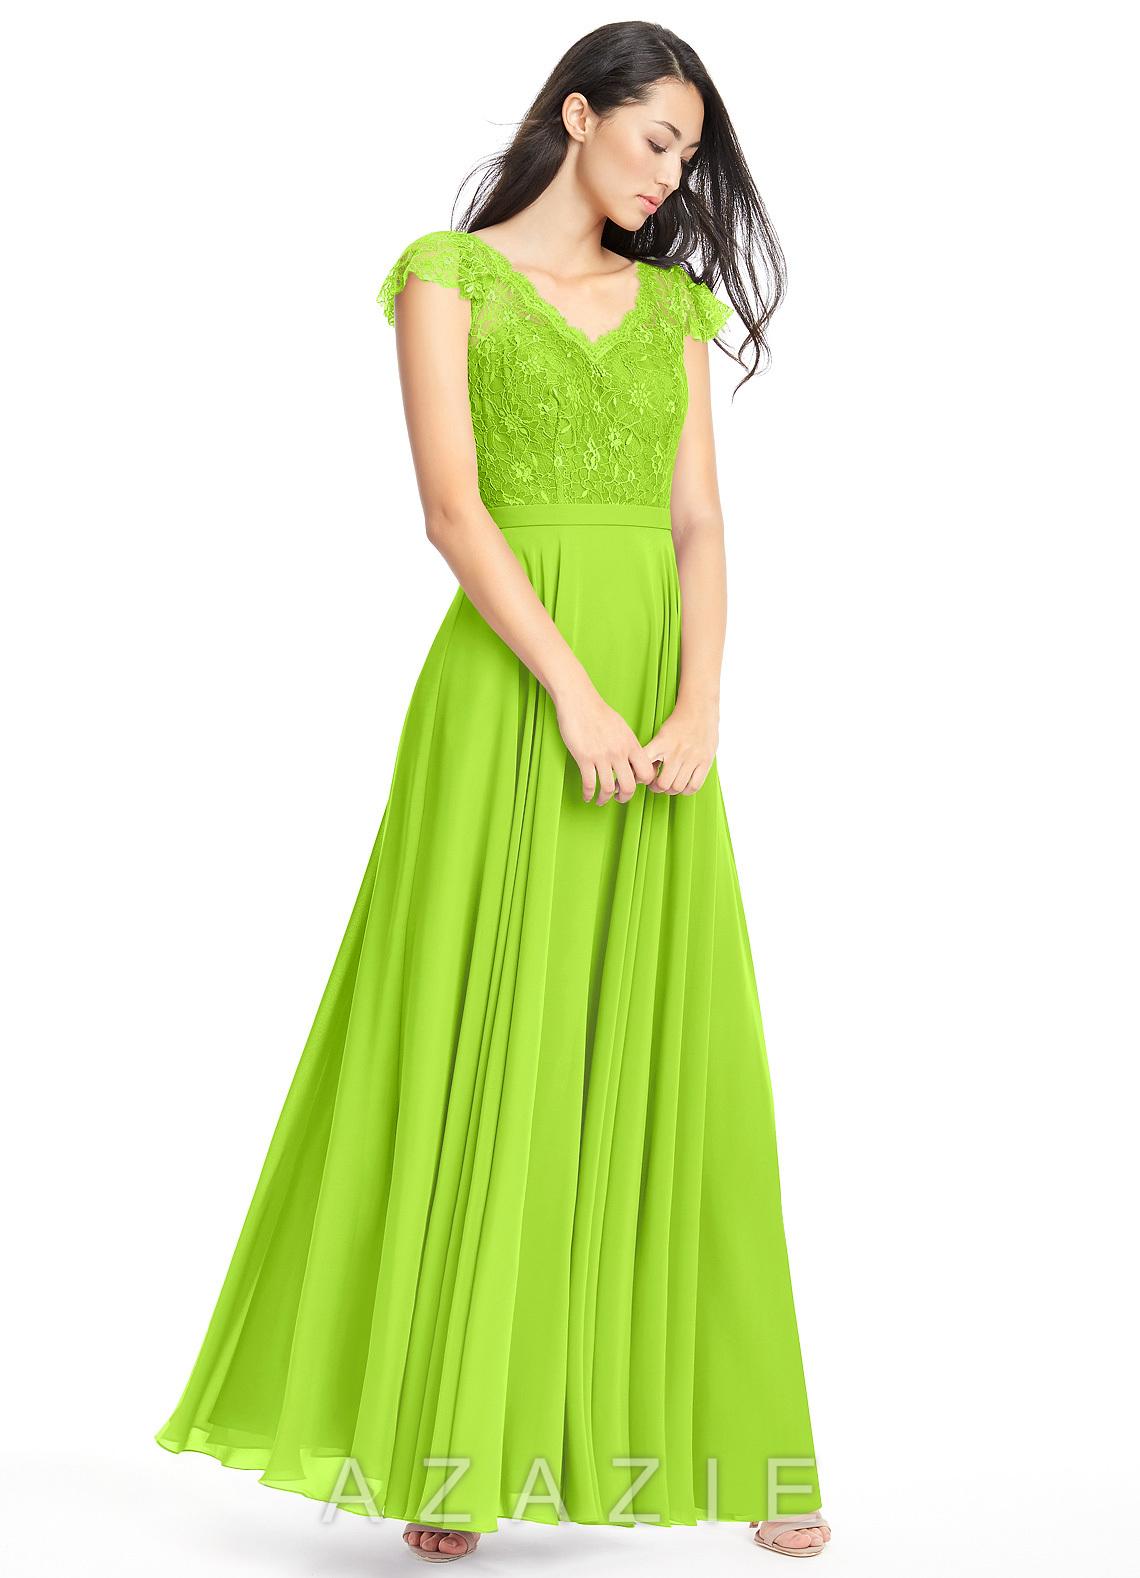 Azazie cheryl bridesmaid dress azazie color lime green ombrellifo Gallery